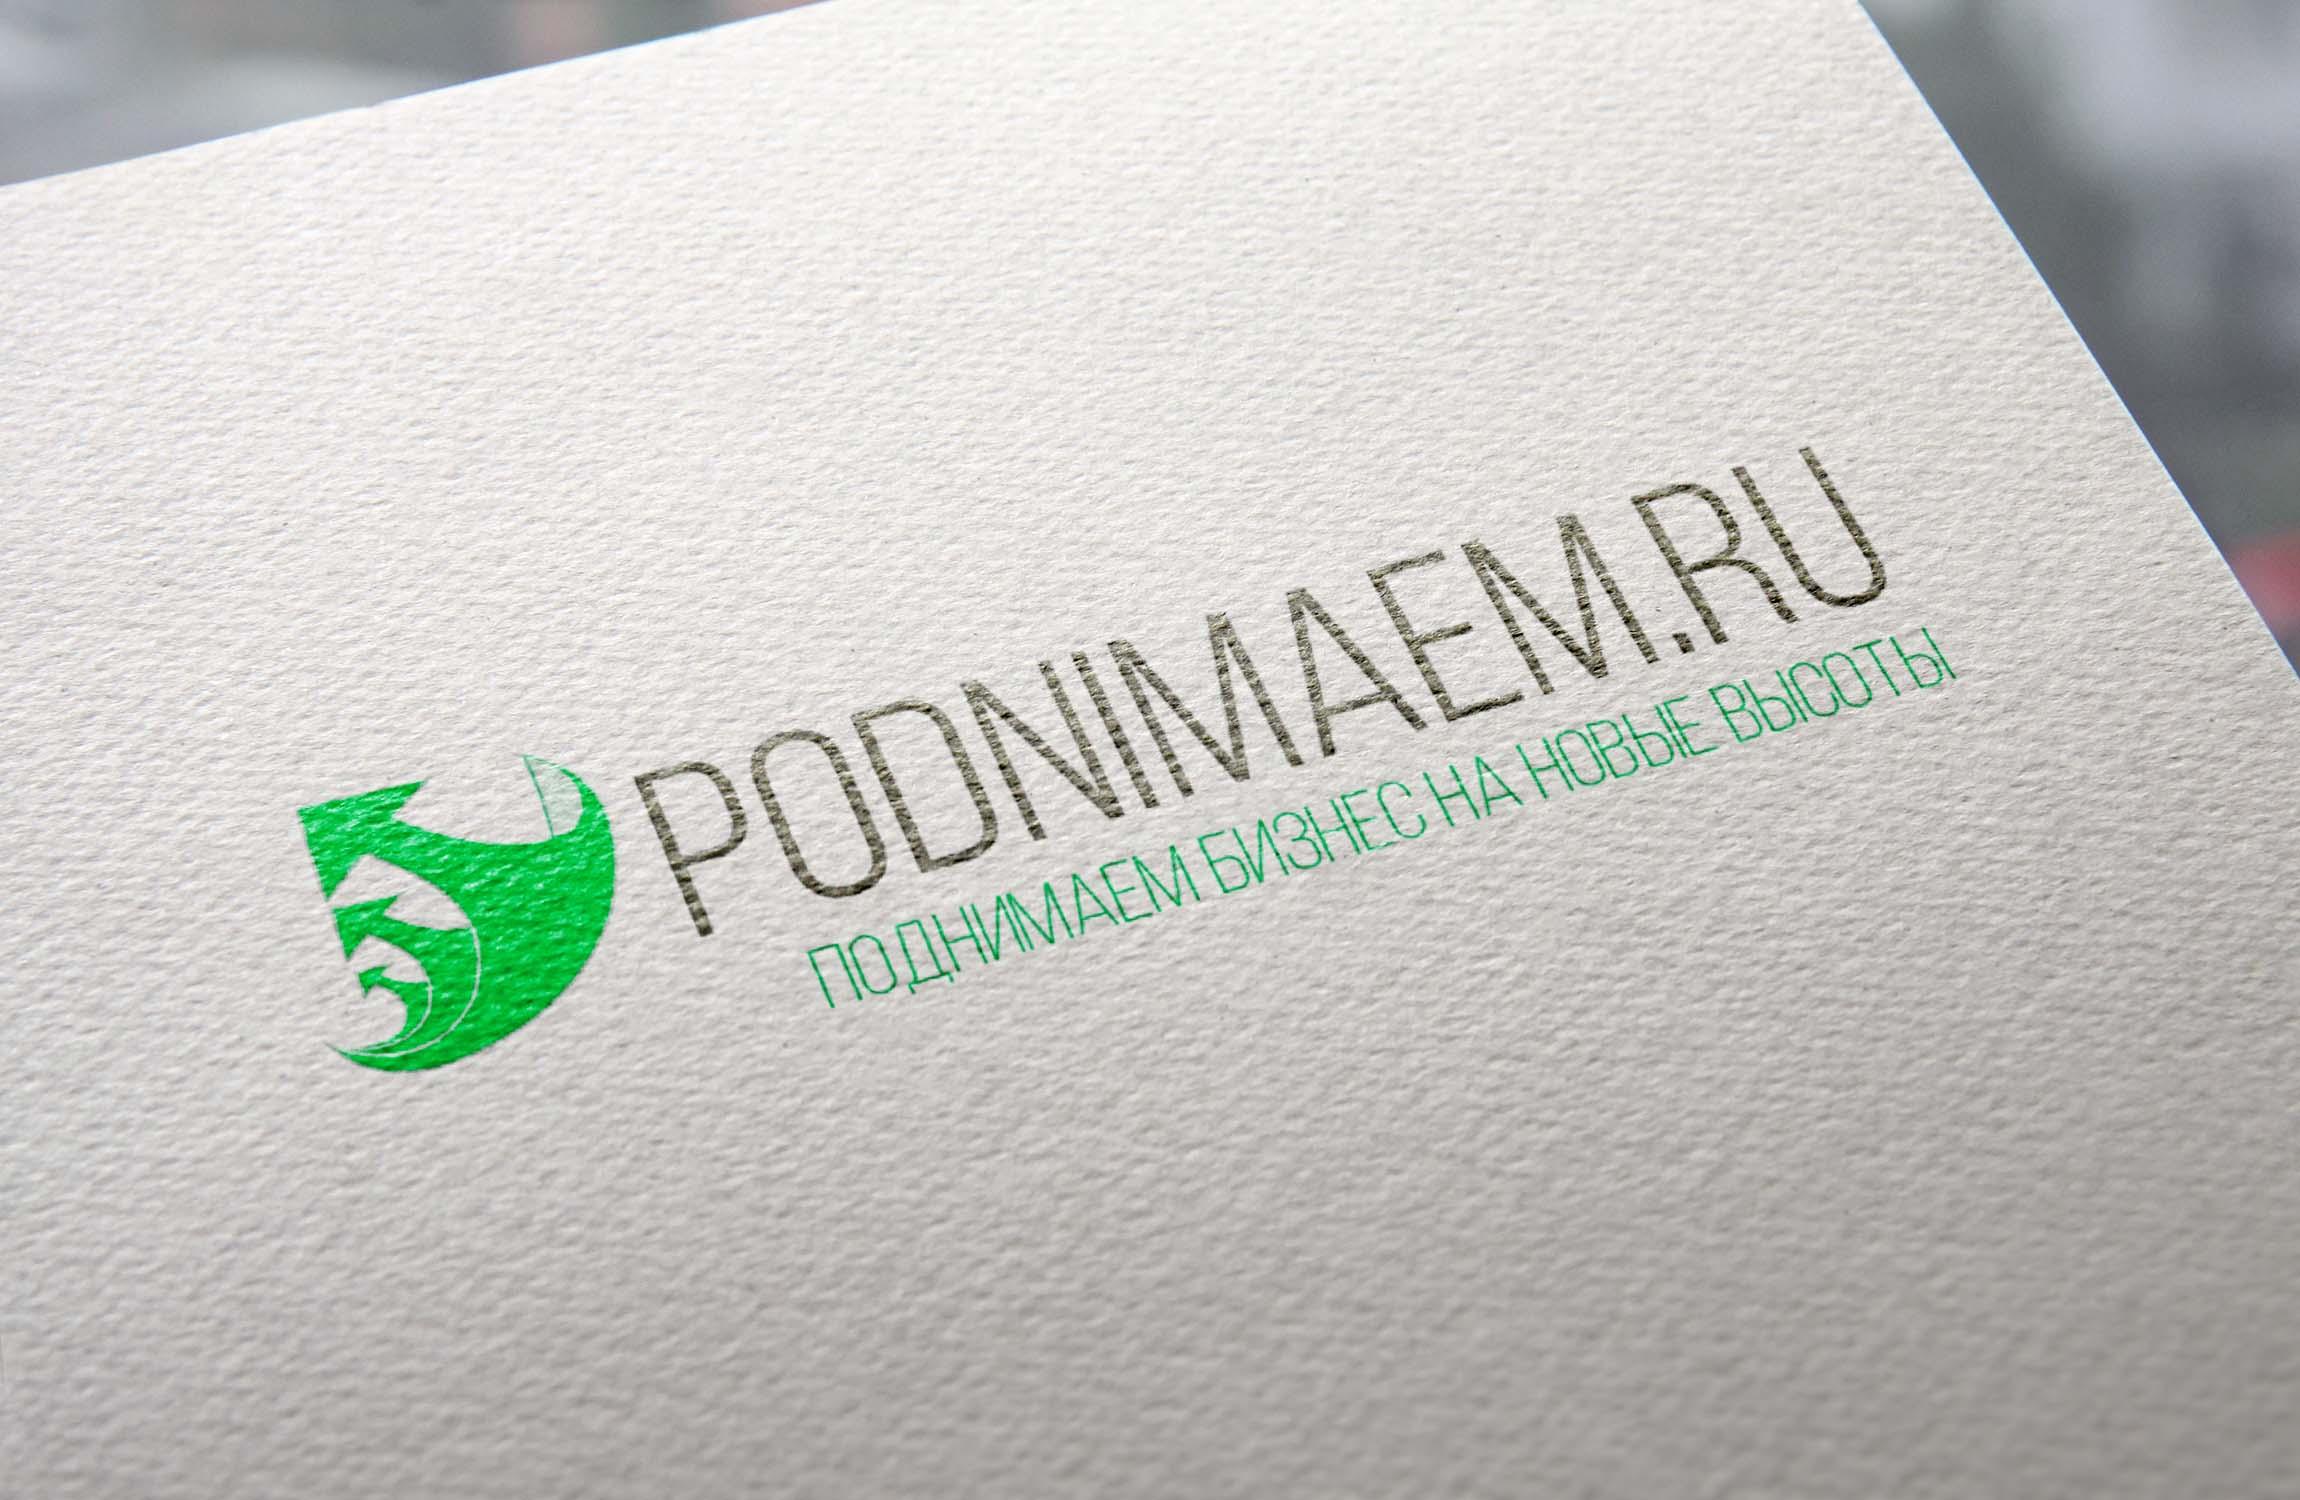 Разработать логотип + визитку + логотип для печати ООО +++ фото f_0695546a68265a4f.jpg